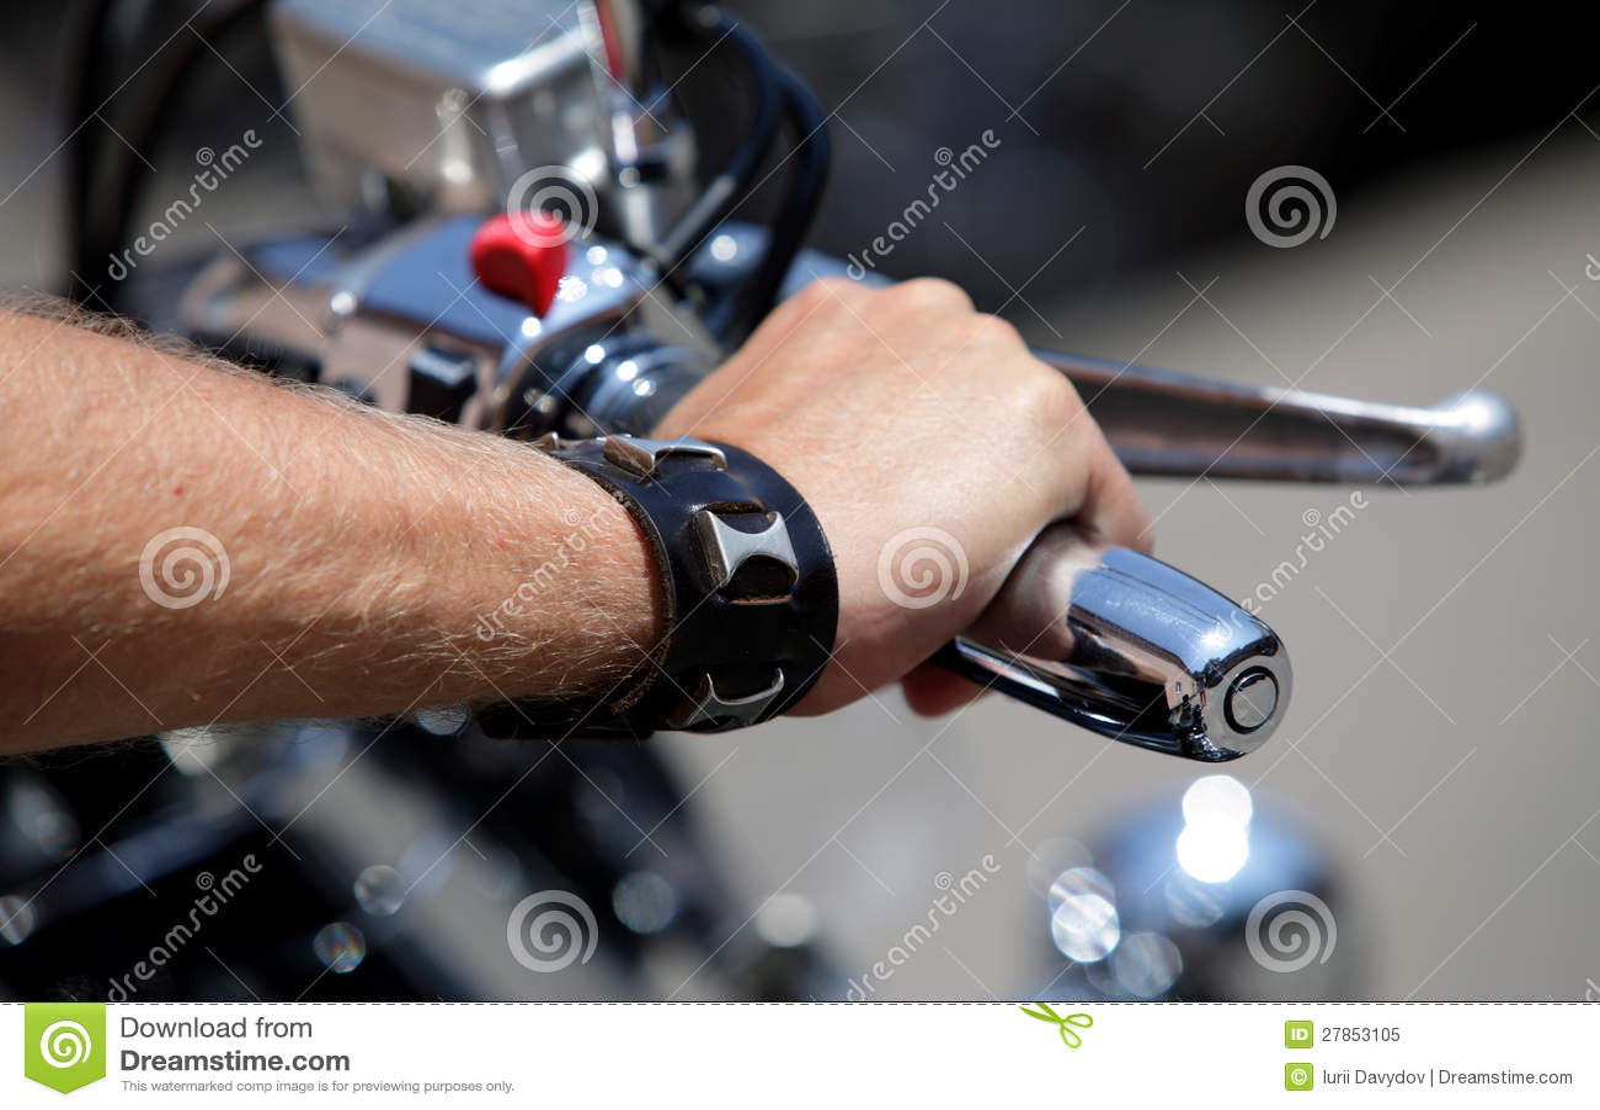 Na handlebars ręka jeździec